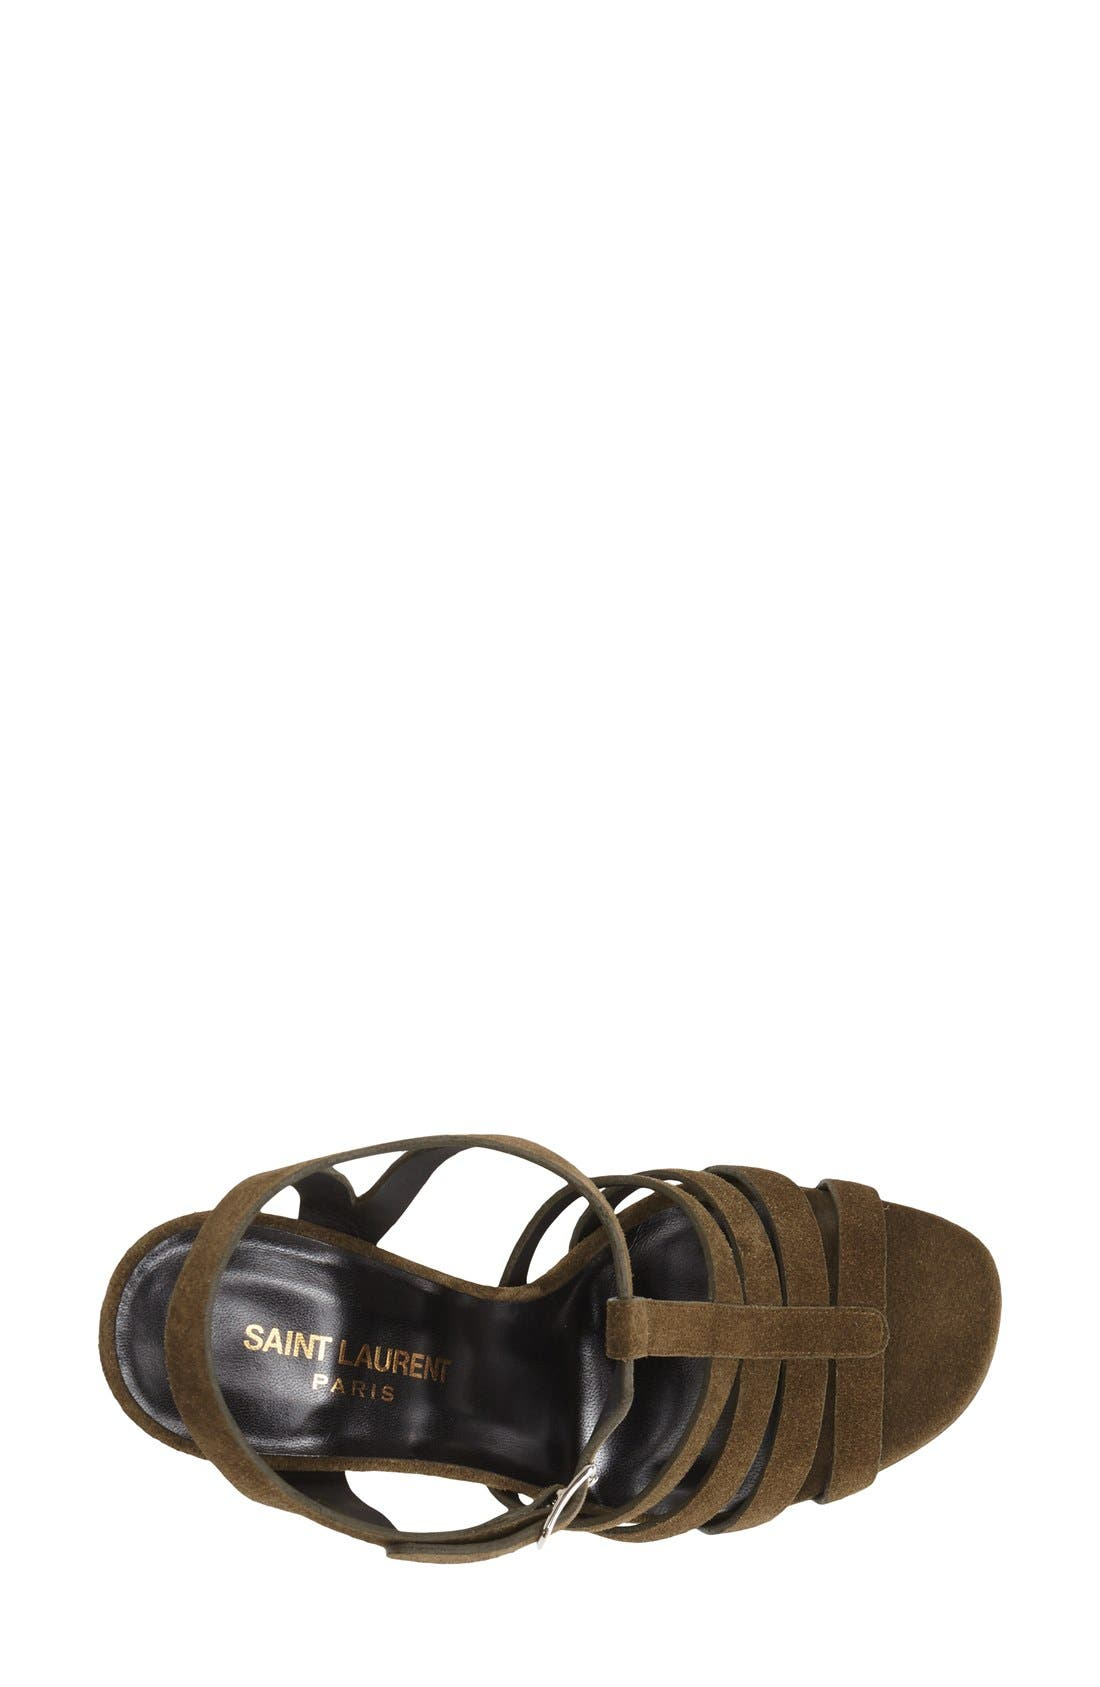 Alternate Image 3  - Saint Laurent 'Bianca' Platform Sandal (Women)